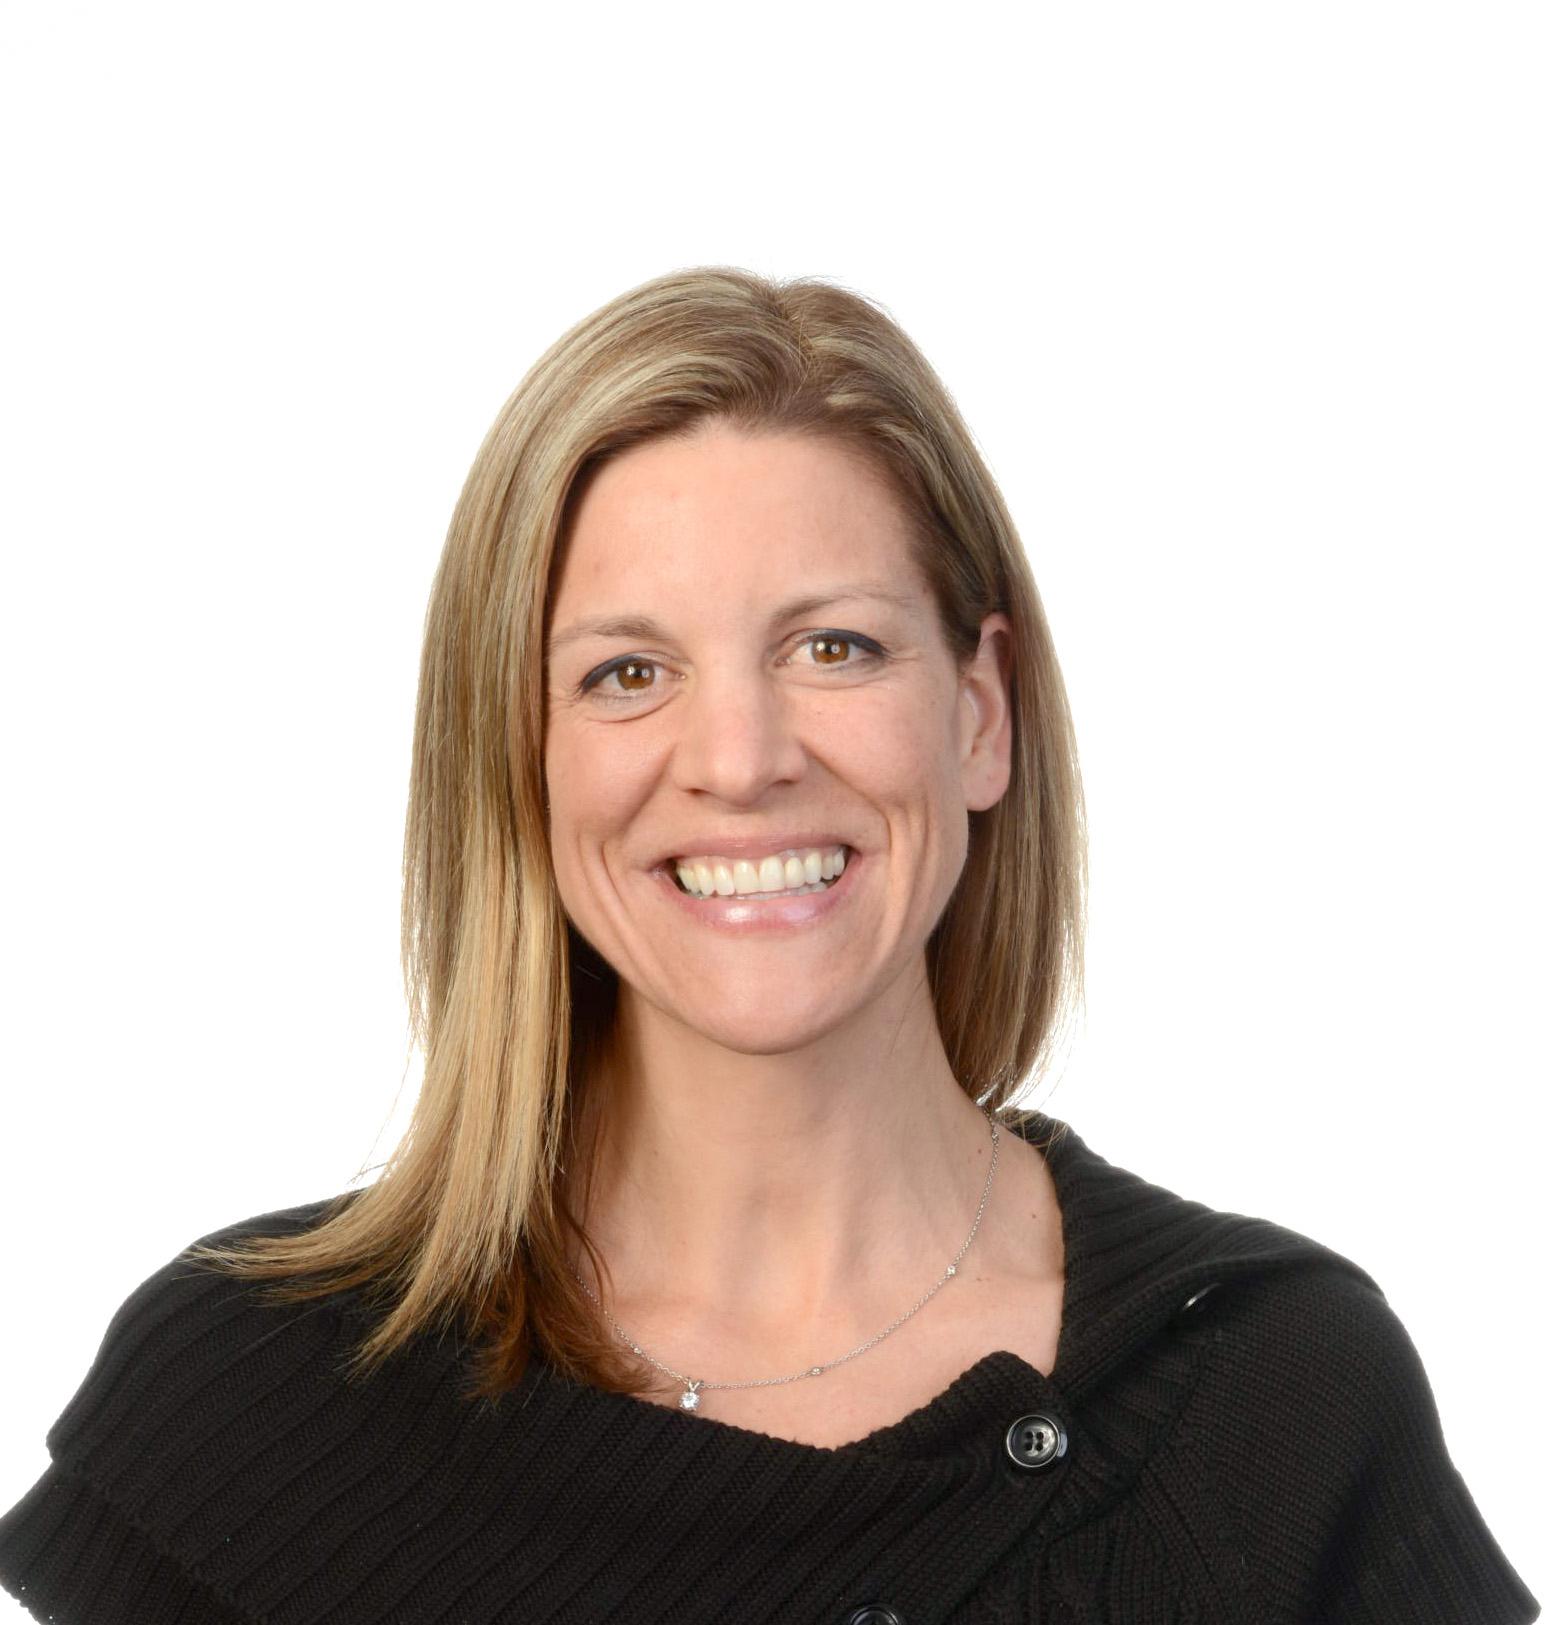 Stephanie Wenstrup DTC Perspectives Advisory Board